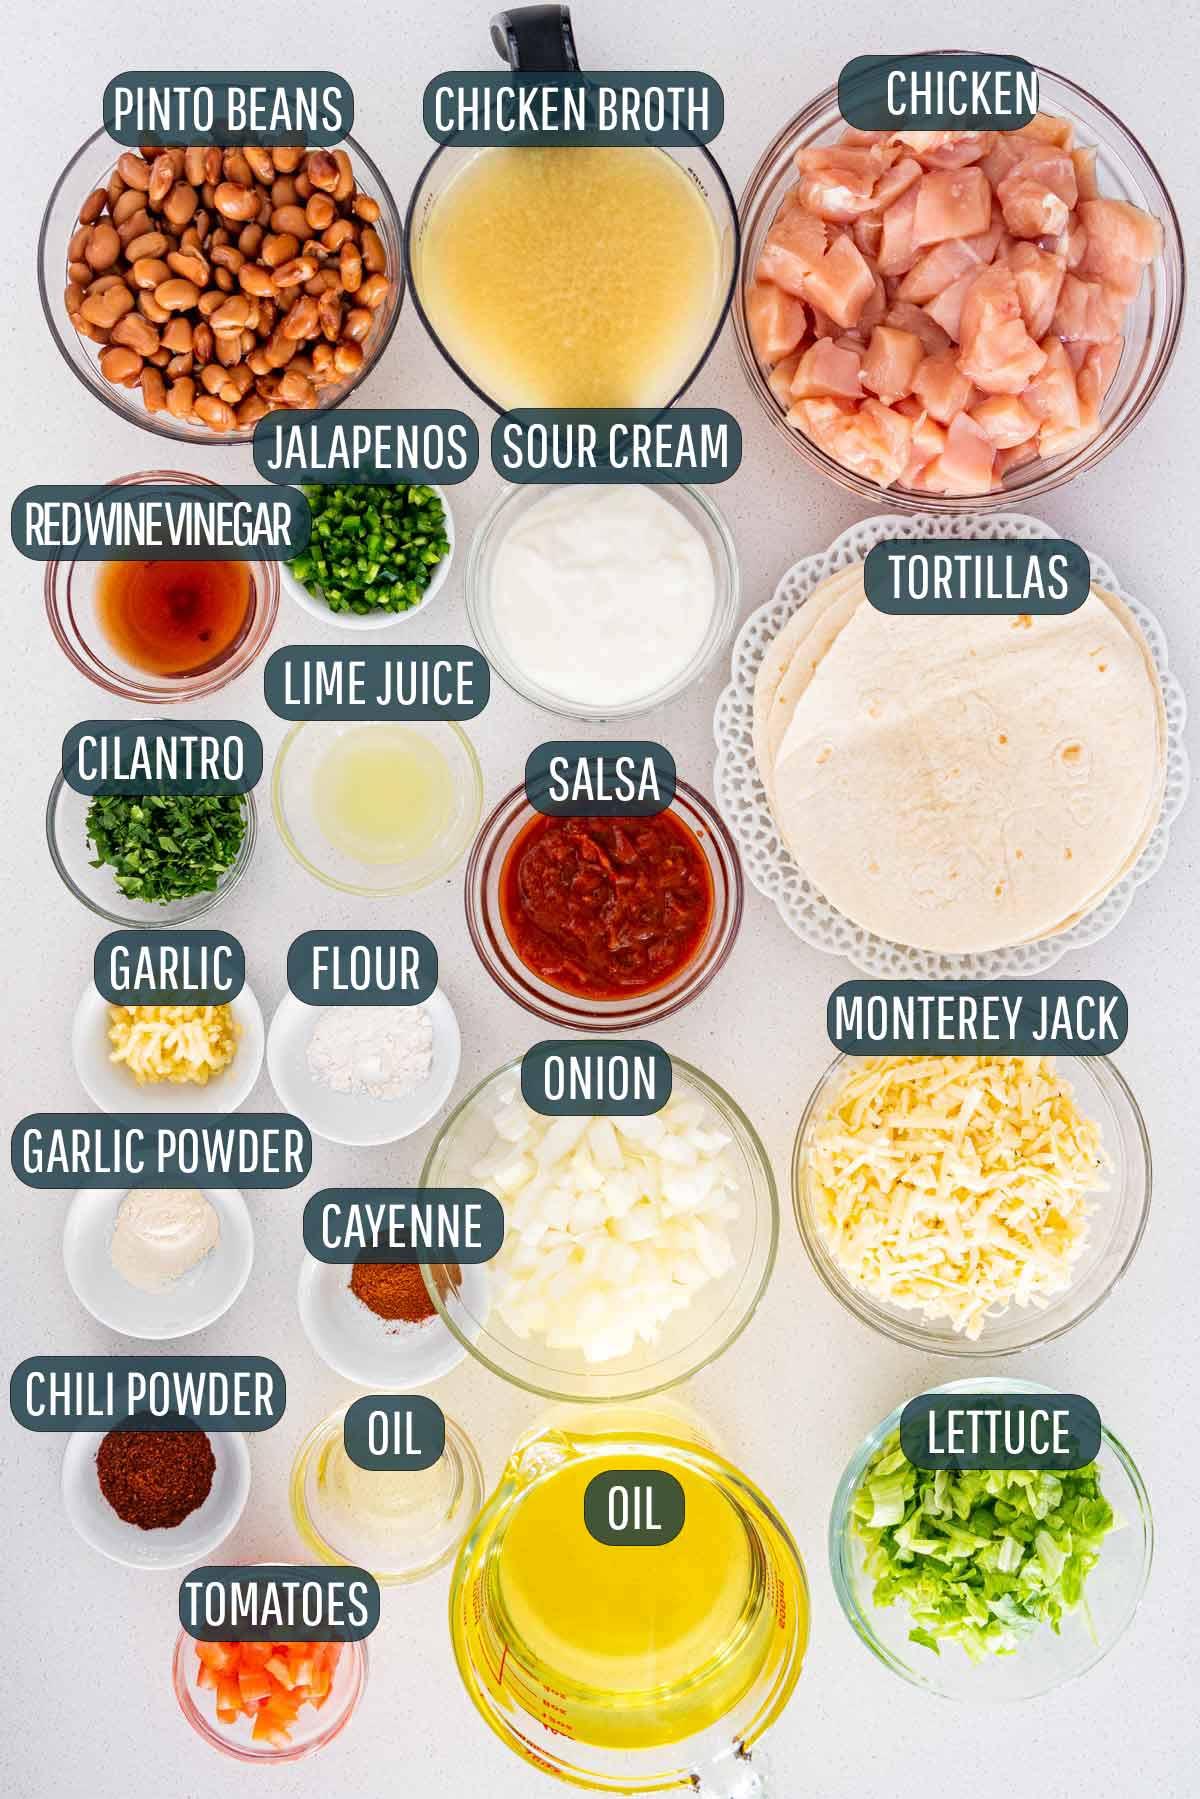 overhead shot of ingredients needed to make chimichangas.